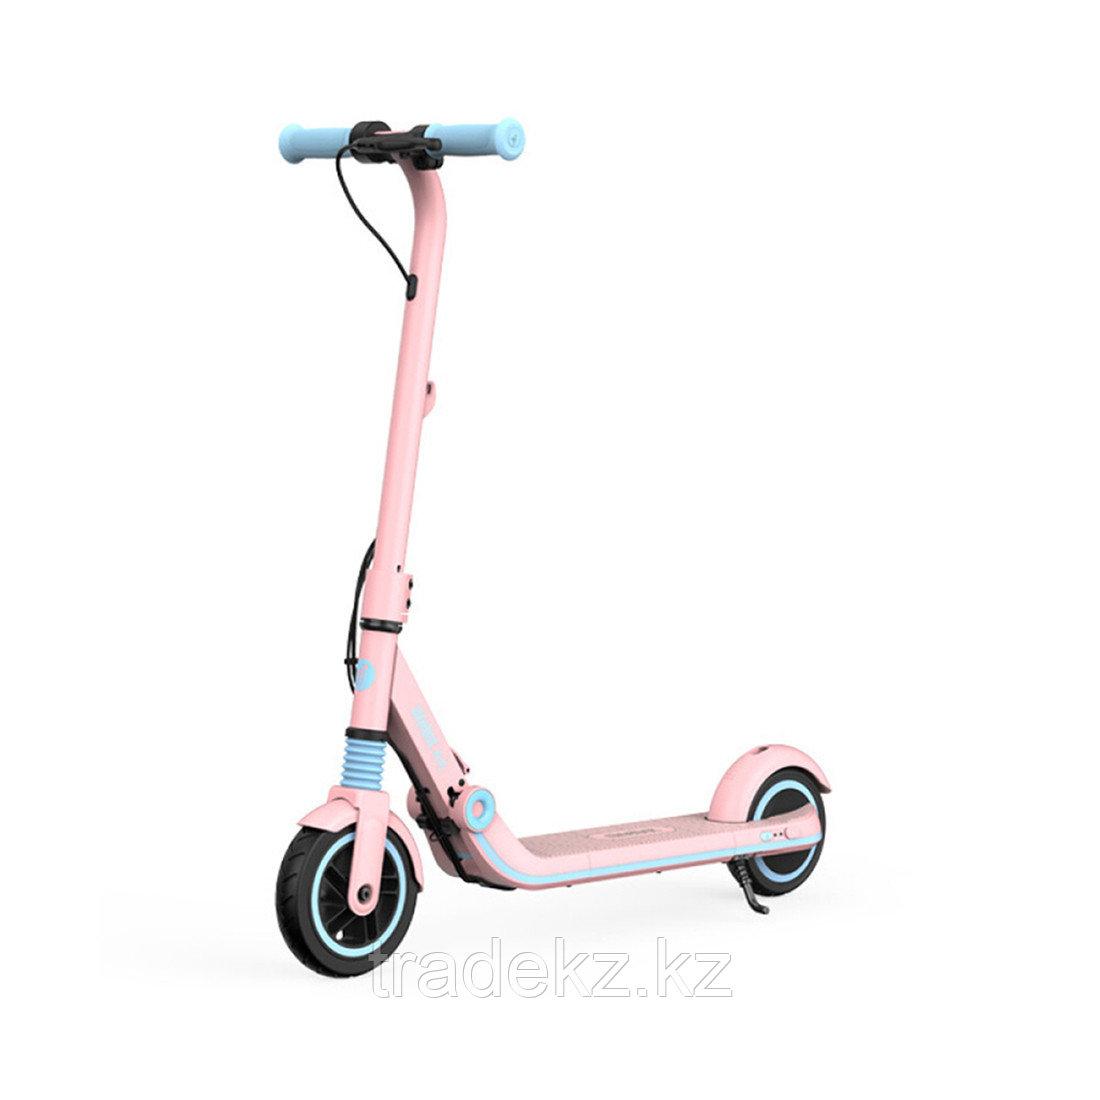 Электросамокат детский Ninebot KickScooter E8 Розовый - фото 1